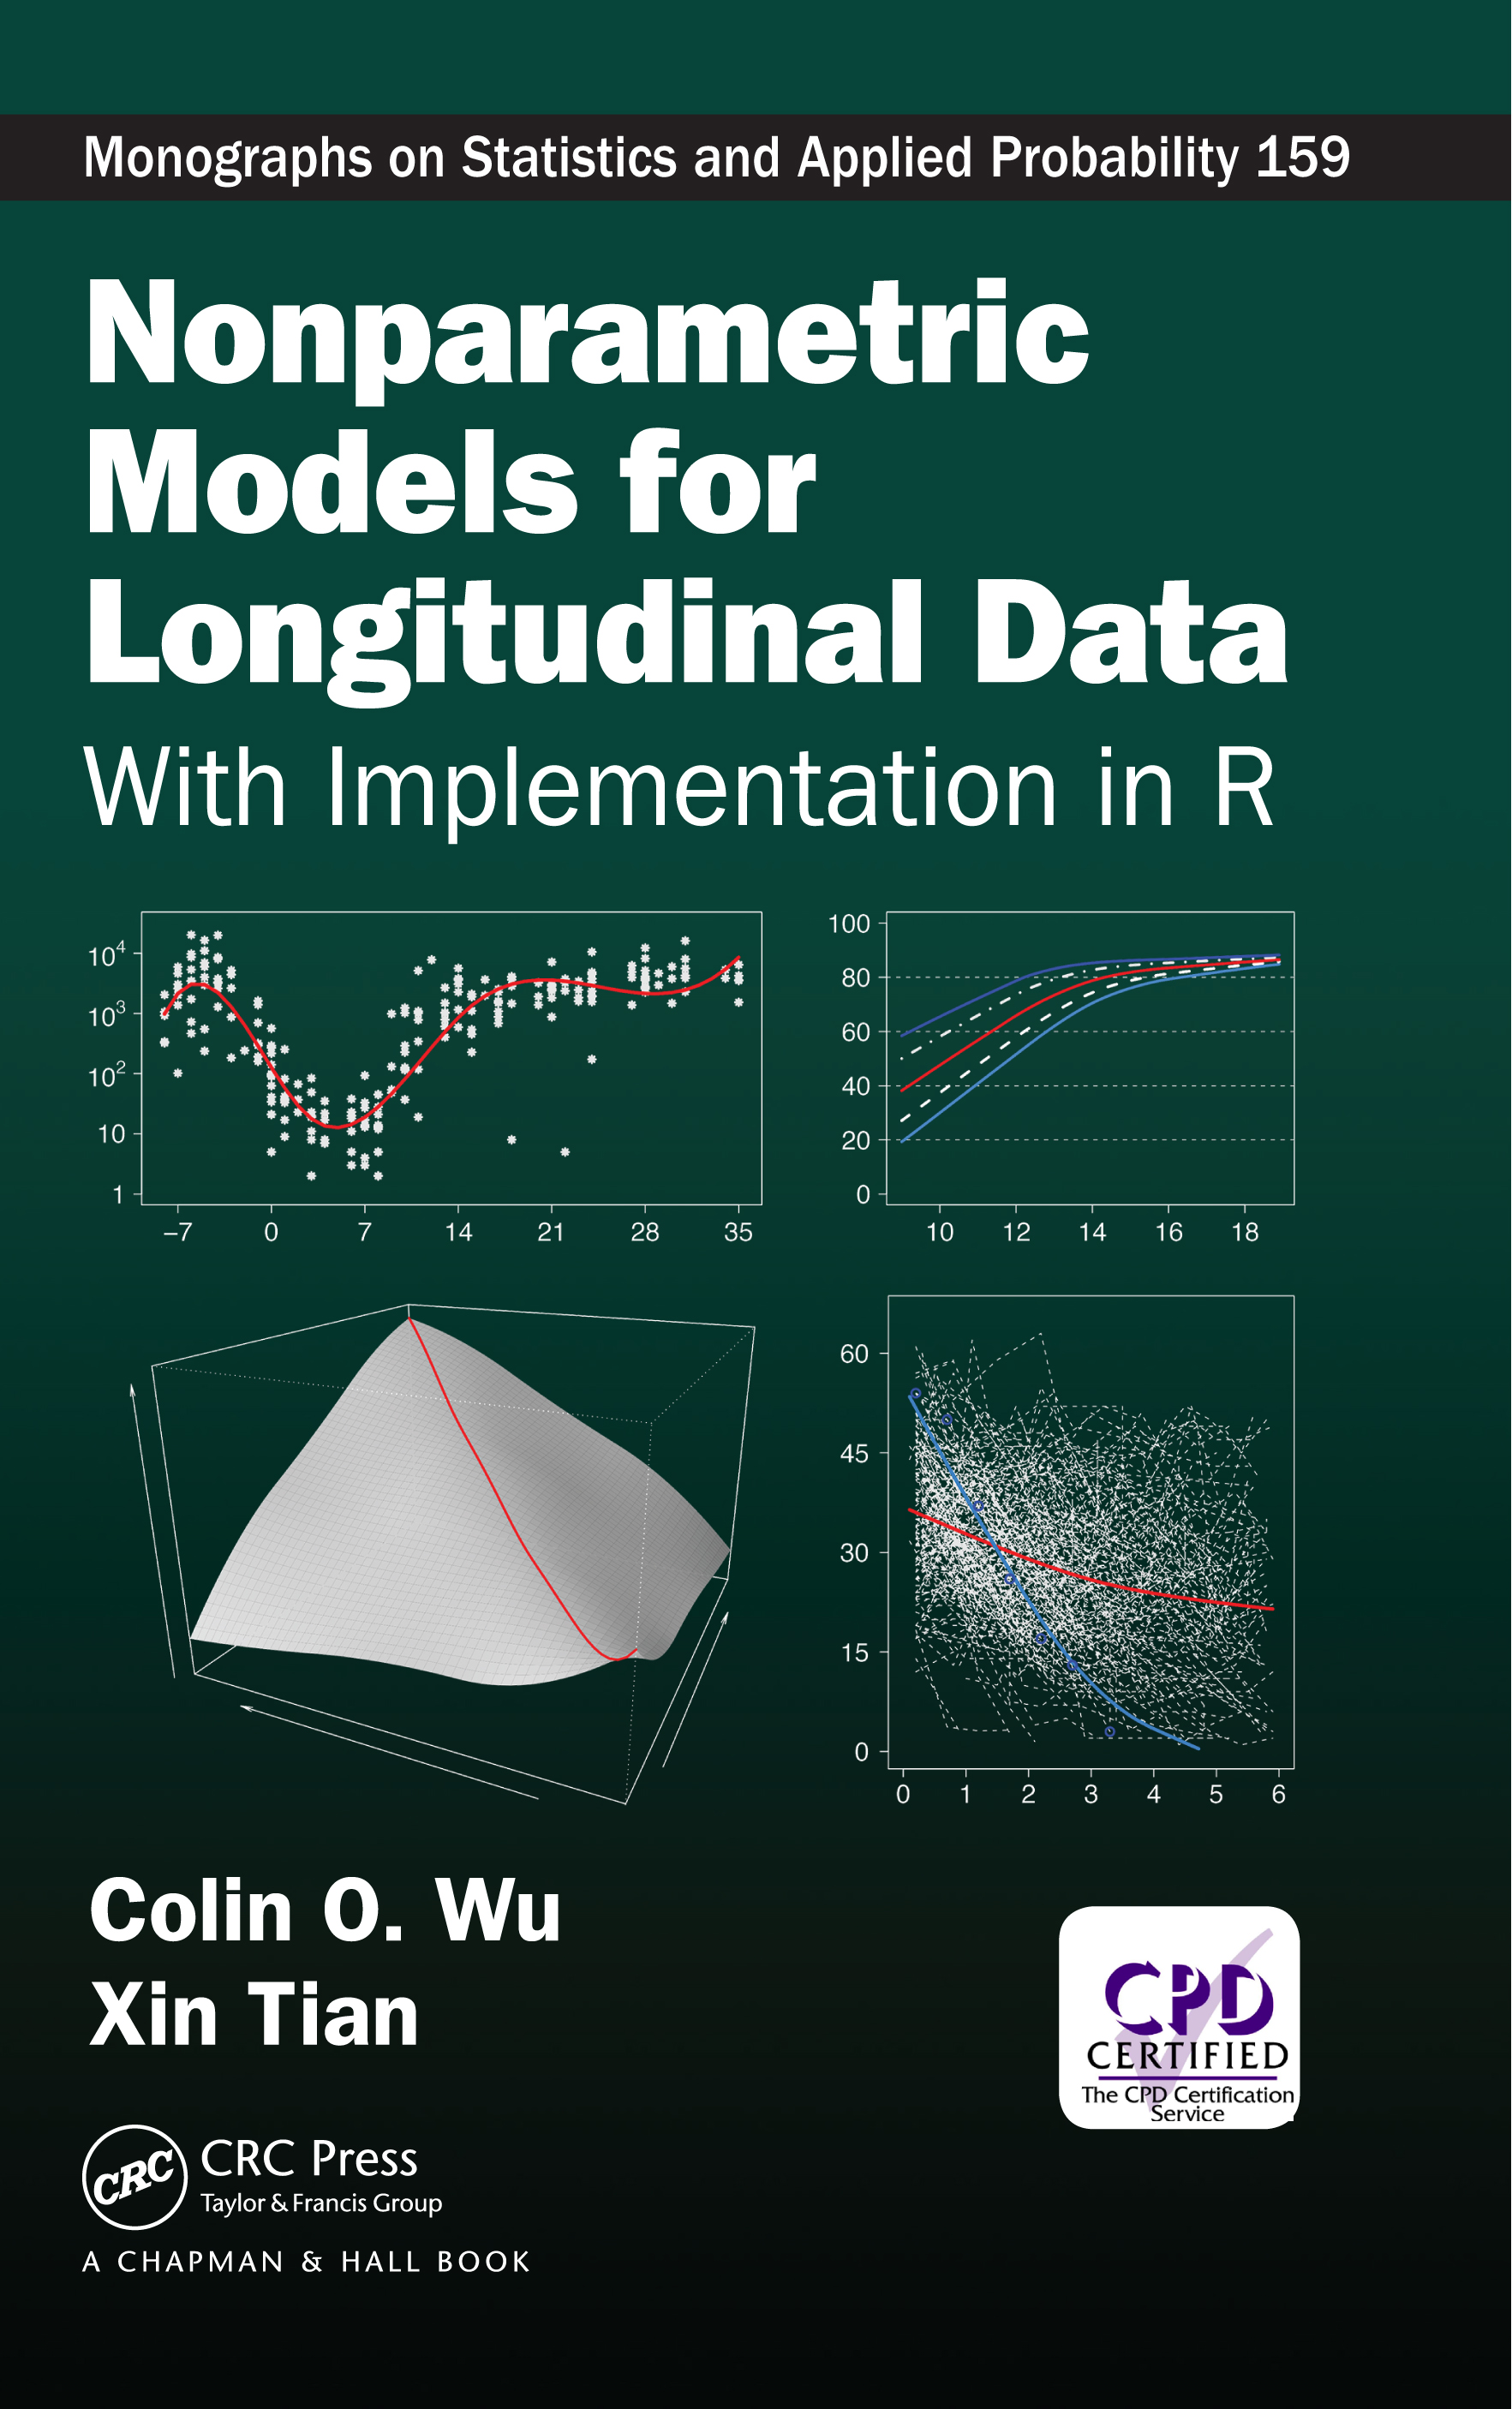 Nonparametric Models for Longitudinal Data